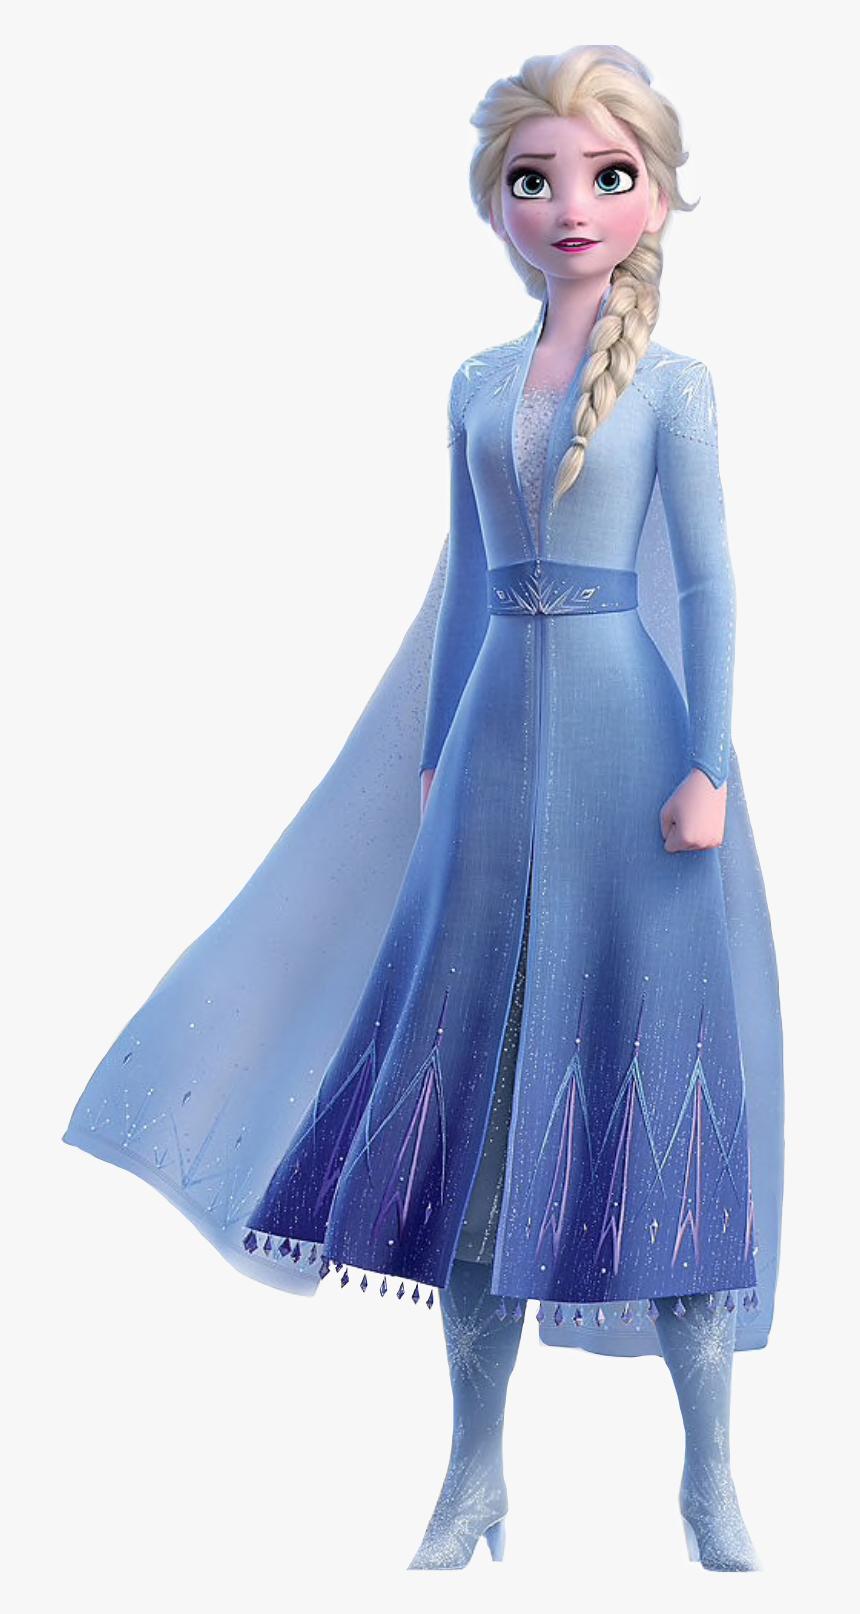 Frozen Frozen2 Png Busqueda De Google Imagens De Princesa Disney Vestido Da Frozen Vestido Da Elsa